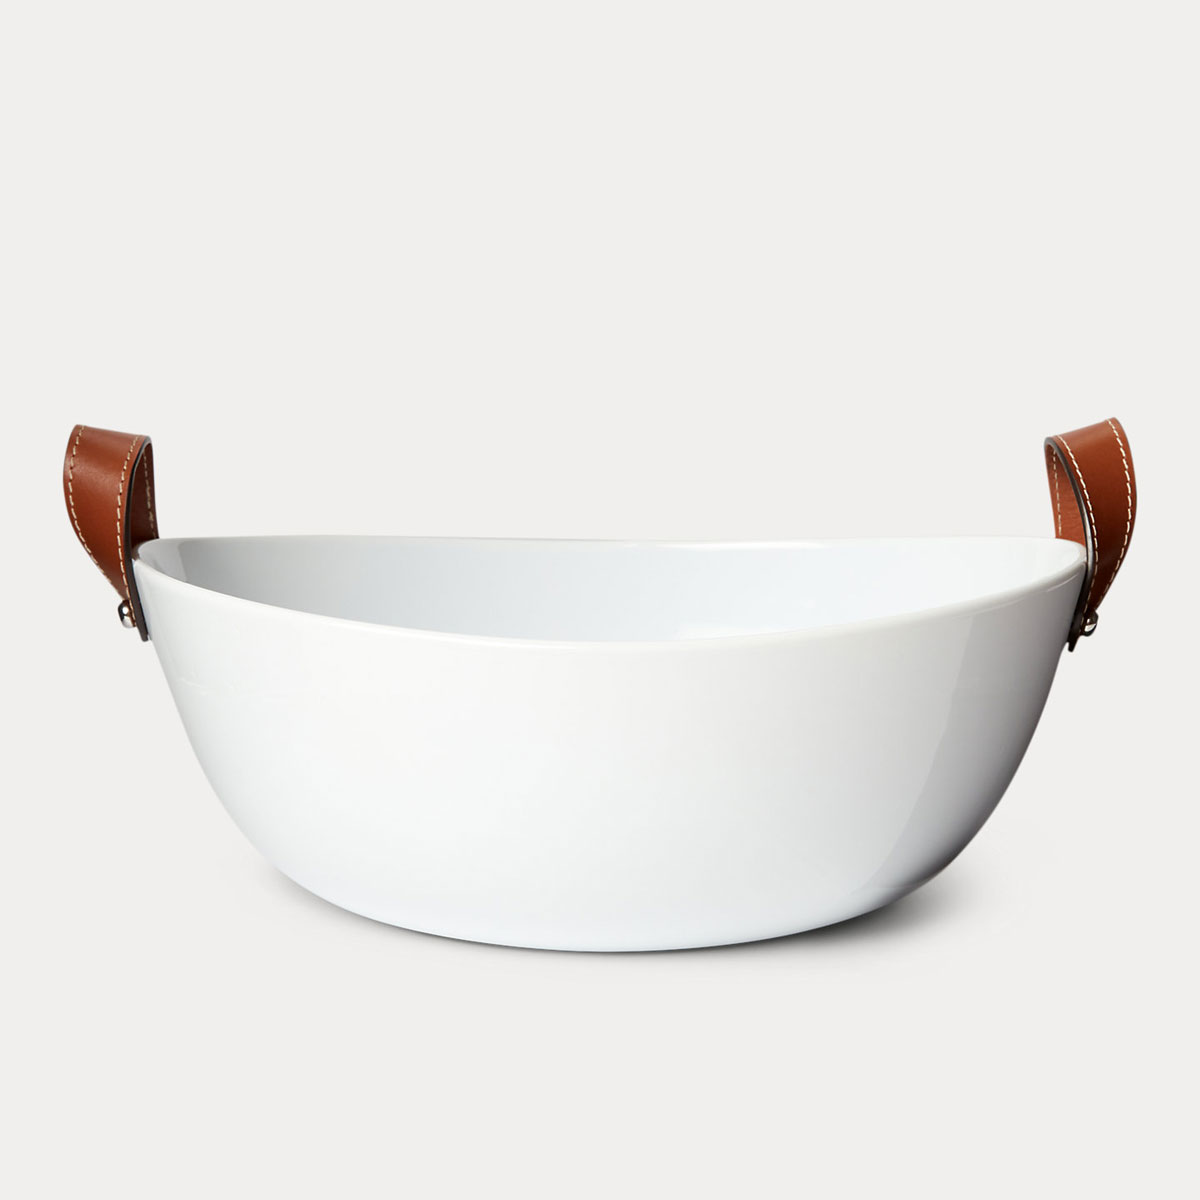 Ralph Lauren China Wyatt Salad Bowl, Saddle